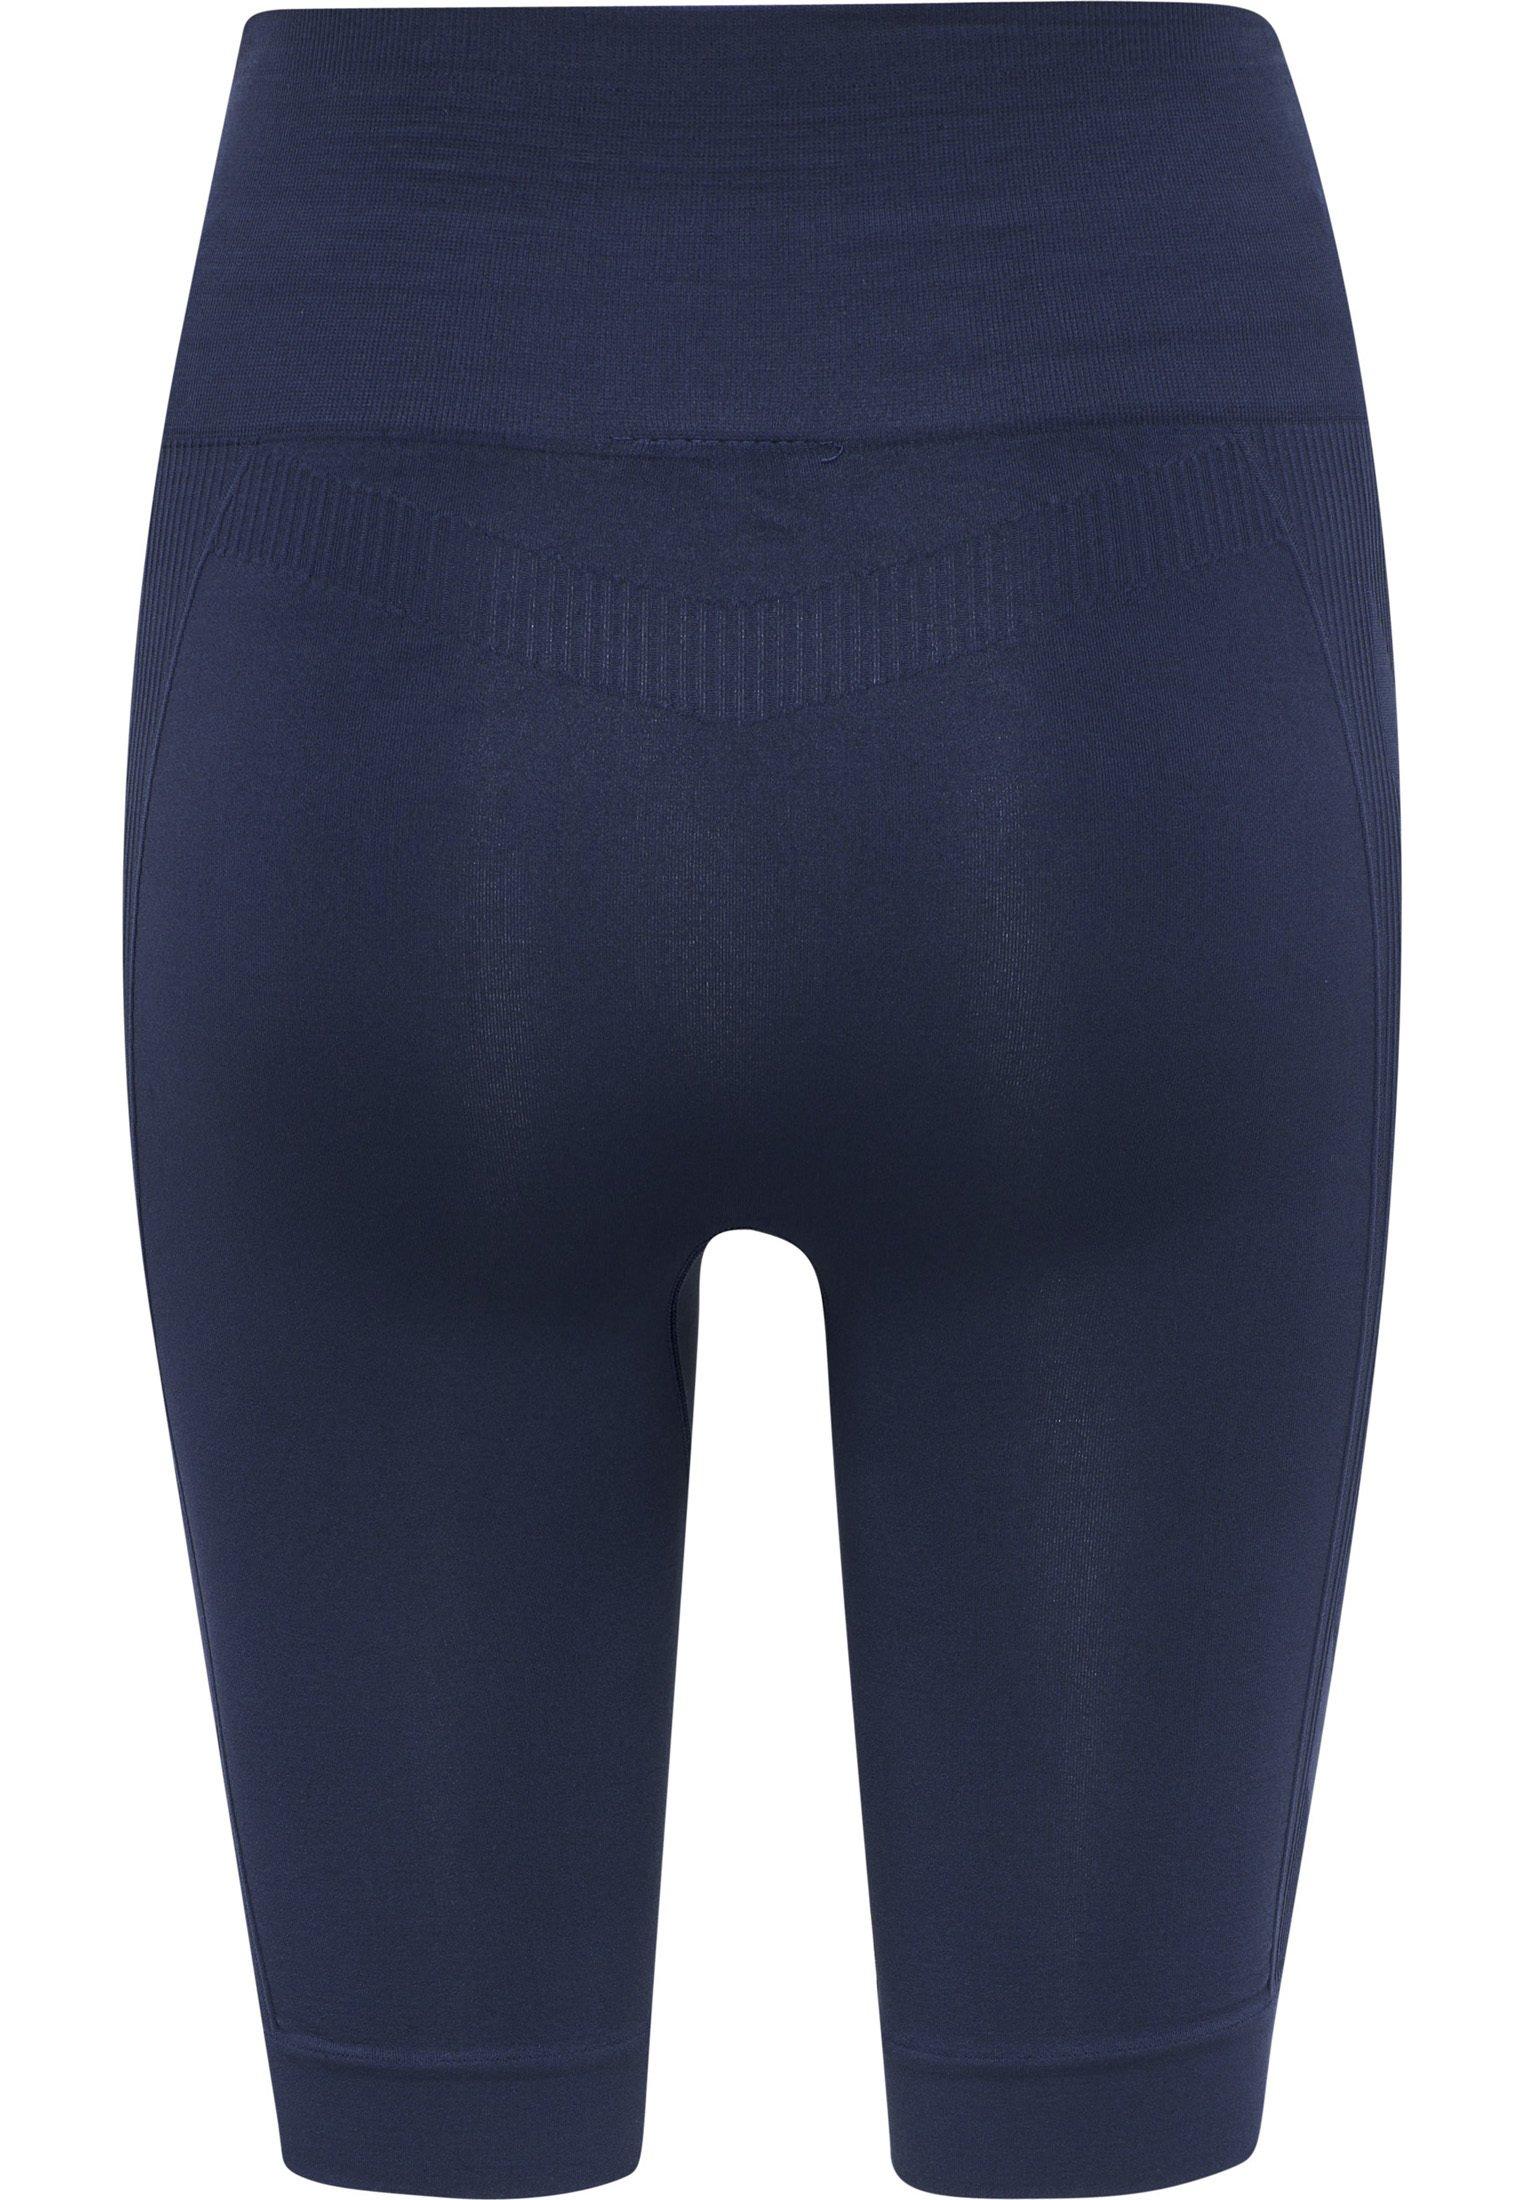 Damen SEAMLESS - Shorts